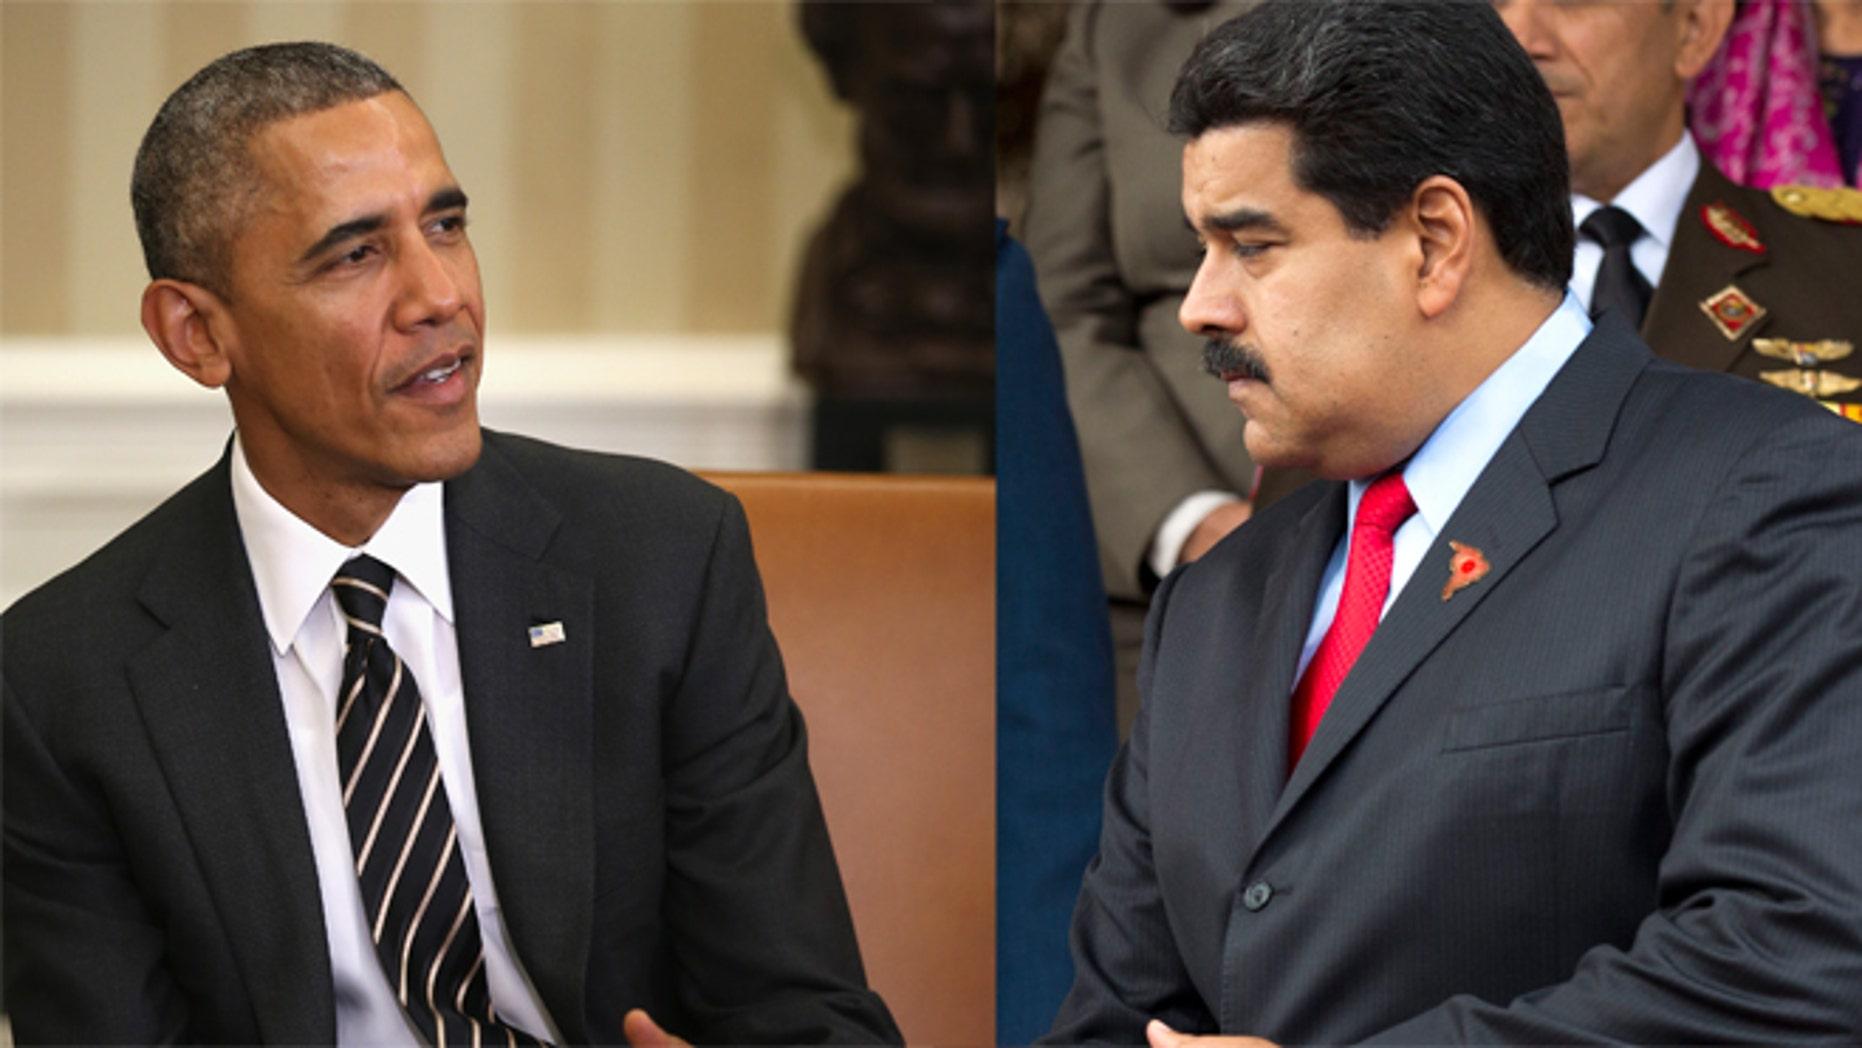 A photo composite of U.S. President Barack Obama (L) and Venezuelan President Nicolás Maduro.